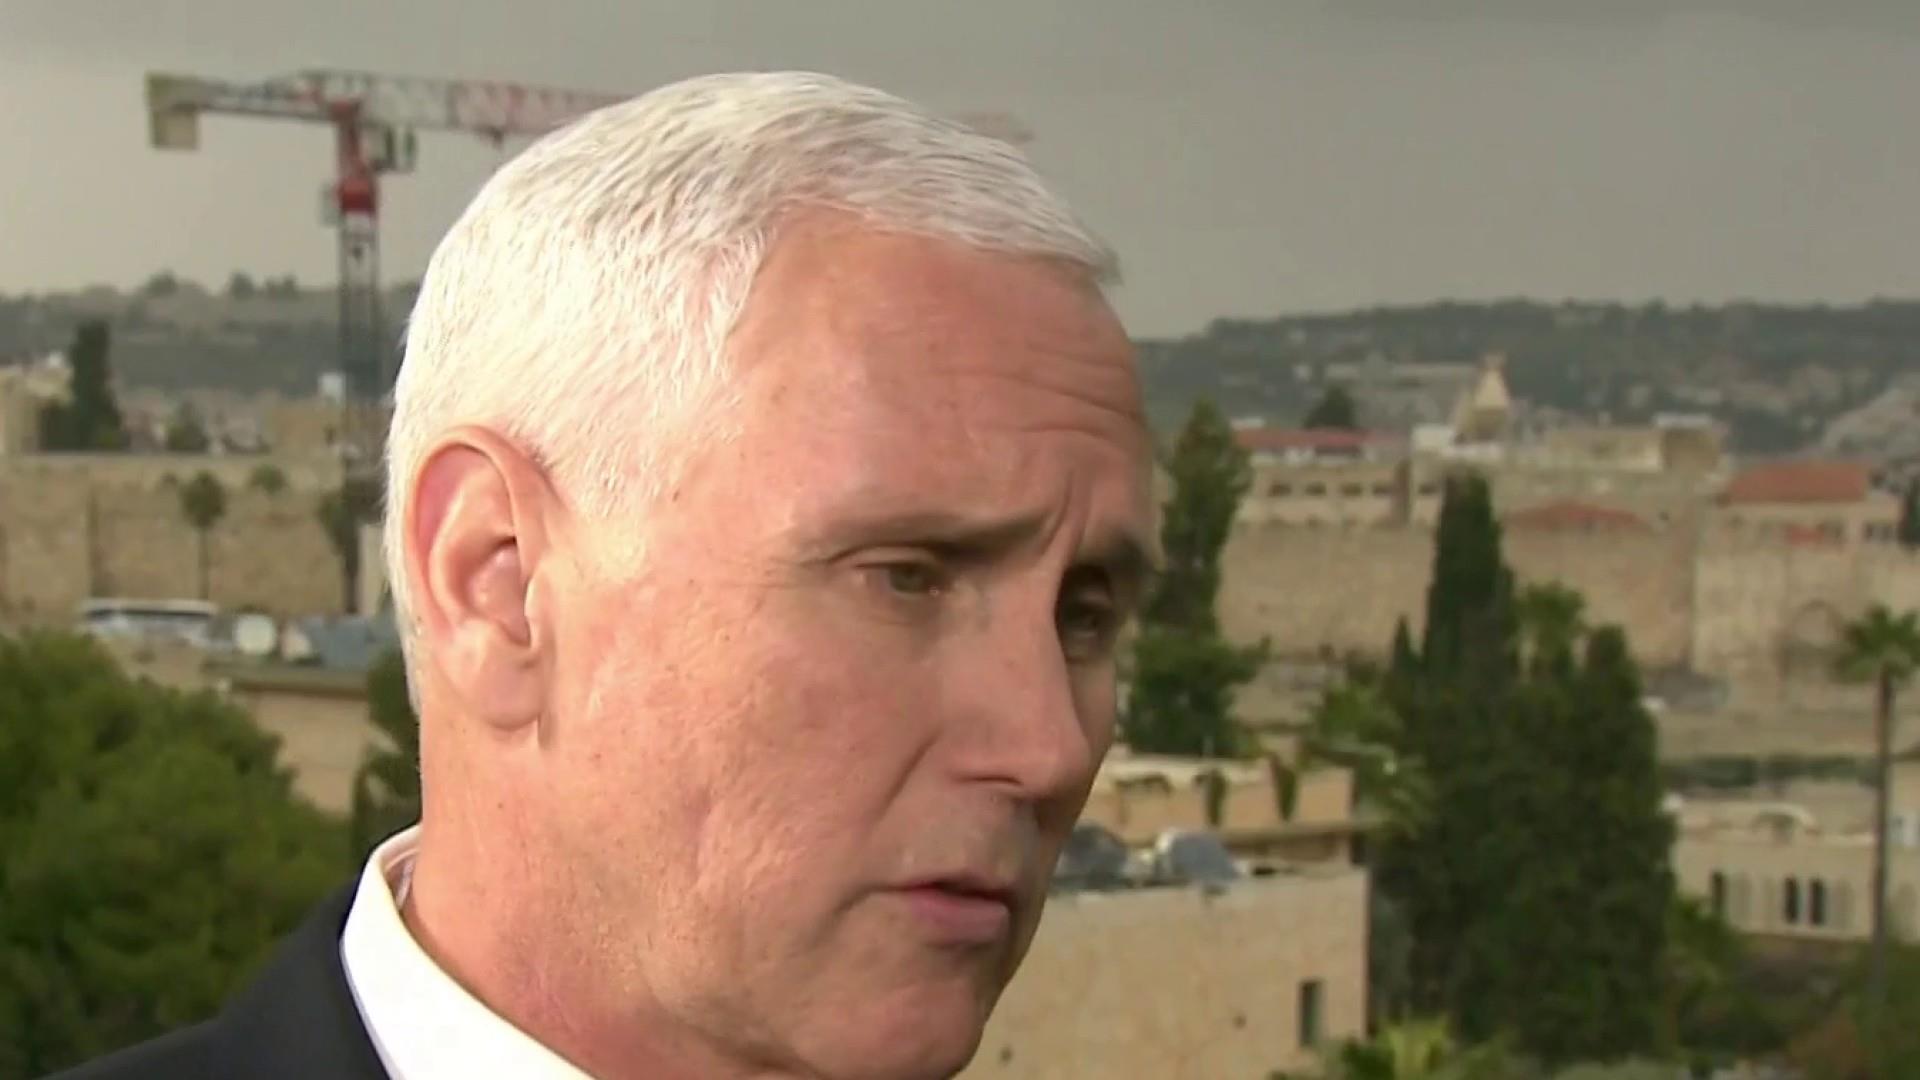 Pence: Gov't shutdown was 'unnecessary'